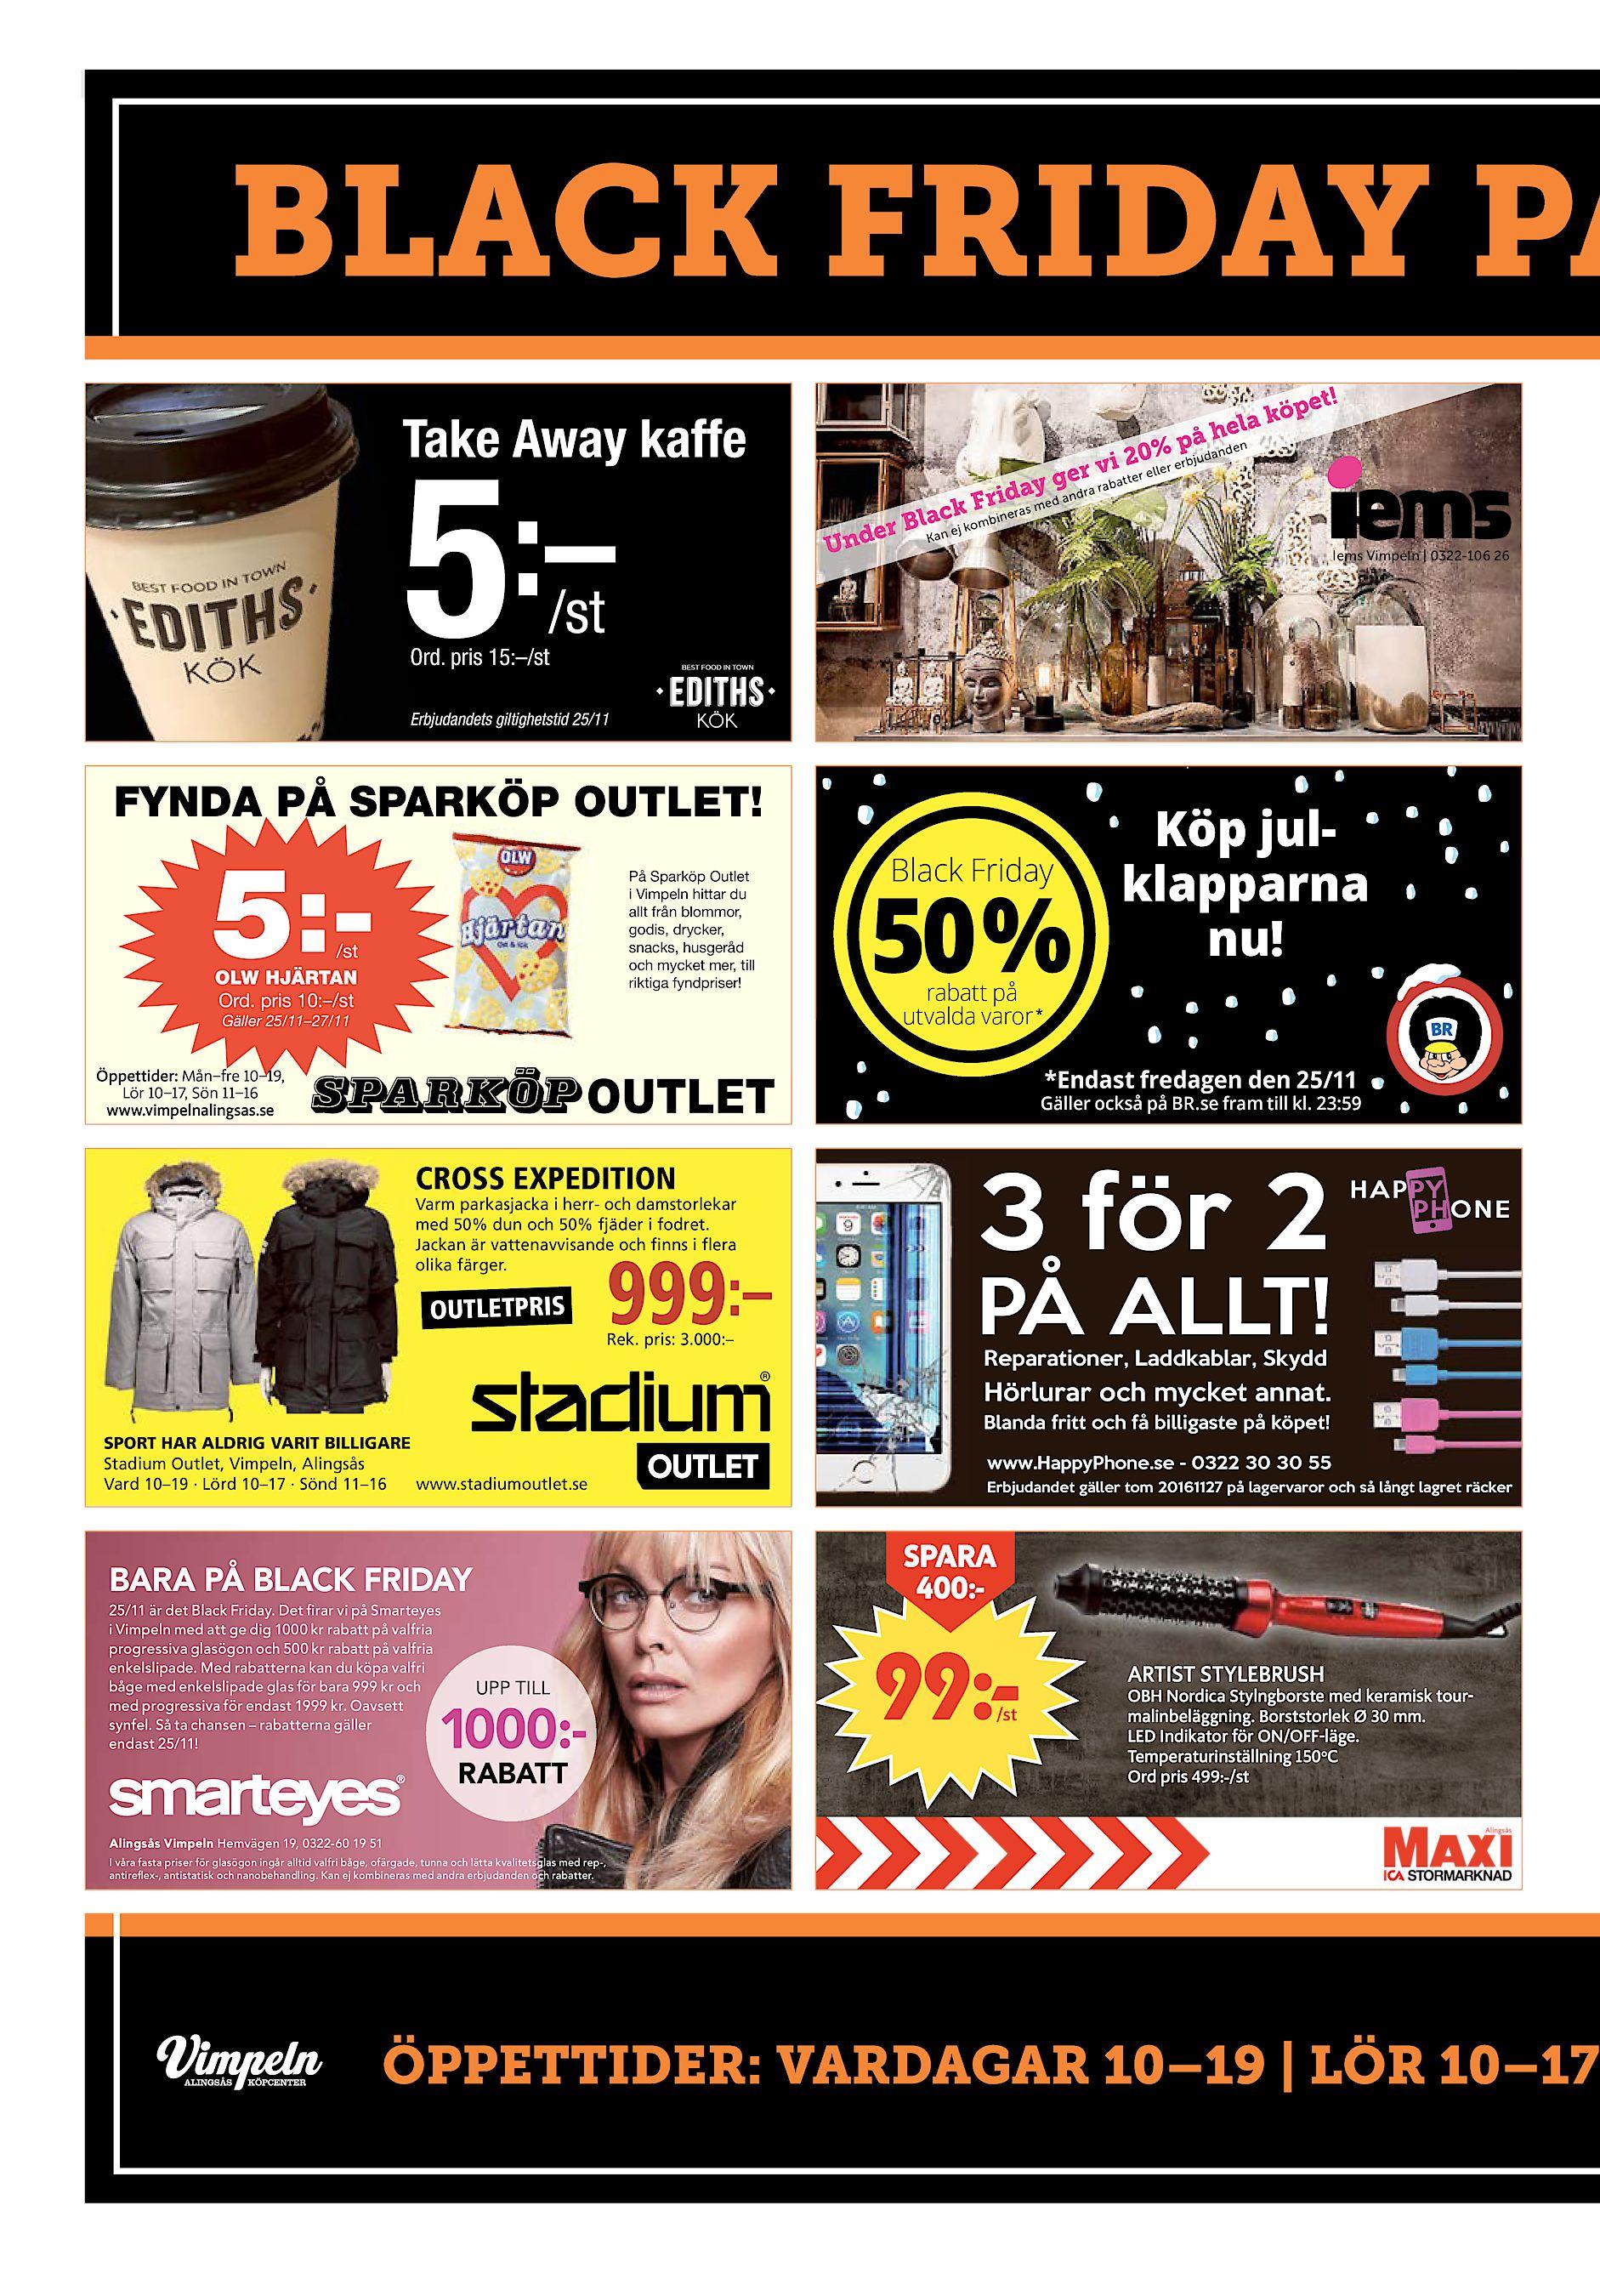 30 Lerums Tidning onsdag 23 november 2016 BLACK FRIDAY PÅ Take Away kaffe   – 5  st pet! la kö å he 0% p danden vi 2 er erbju gedra rabatter ell y ... 085014bebd966